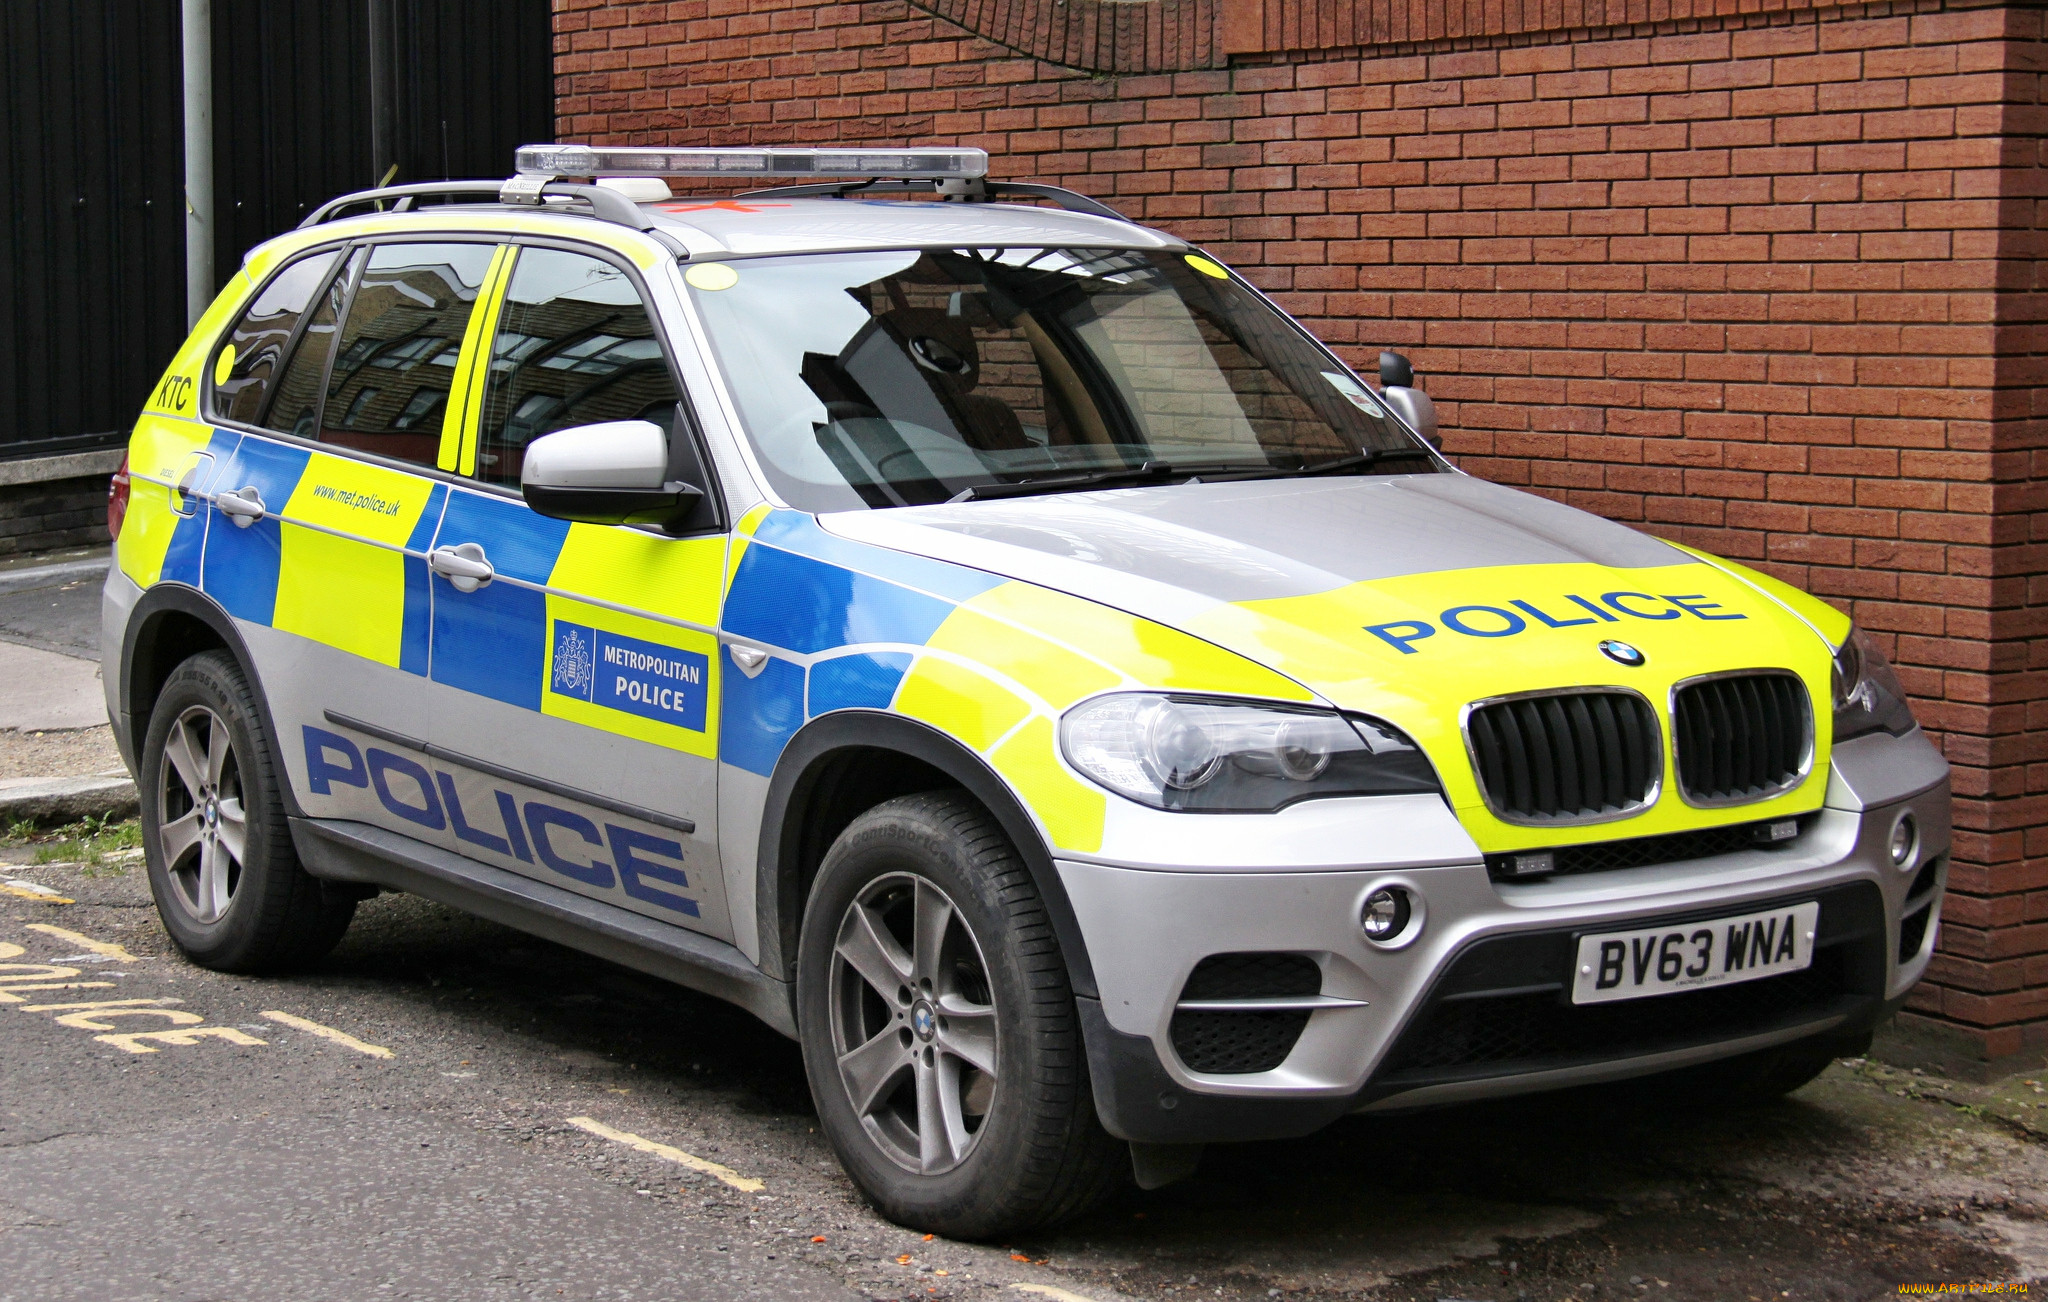 Police спецтехника пассажирские перевозки по городу самара